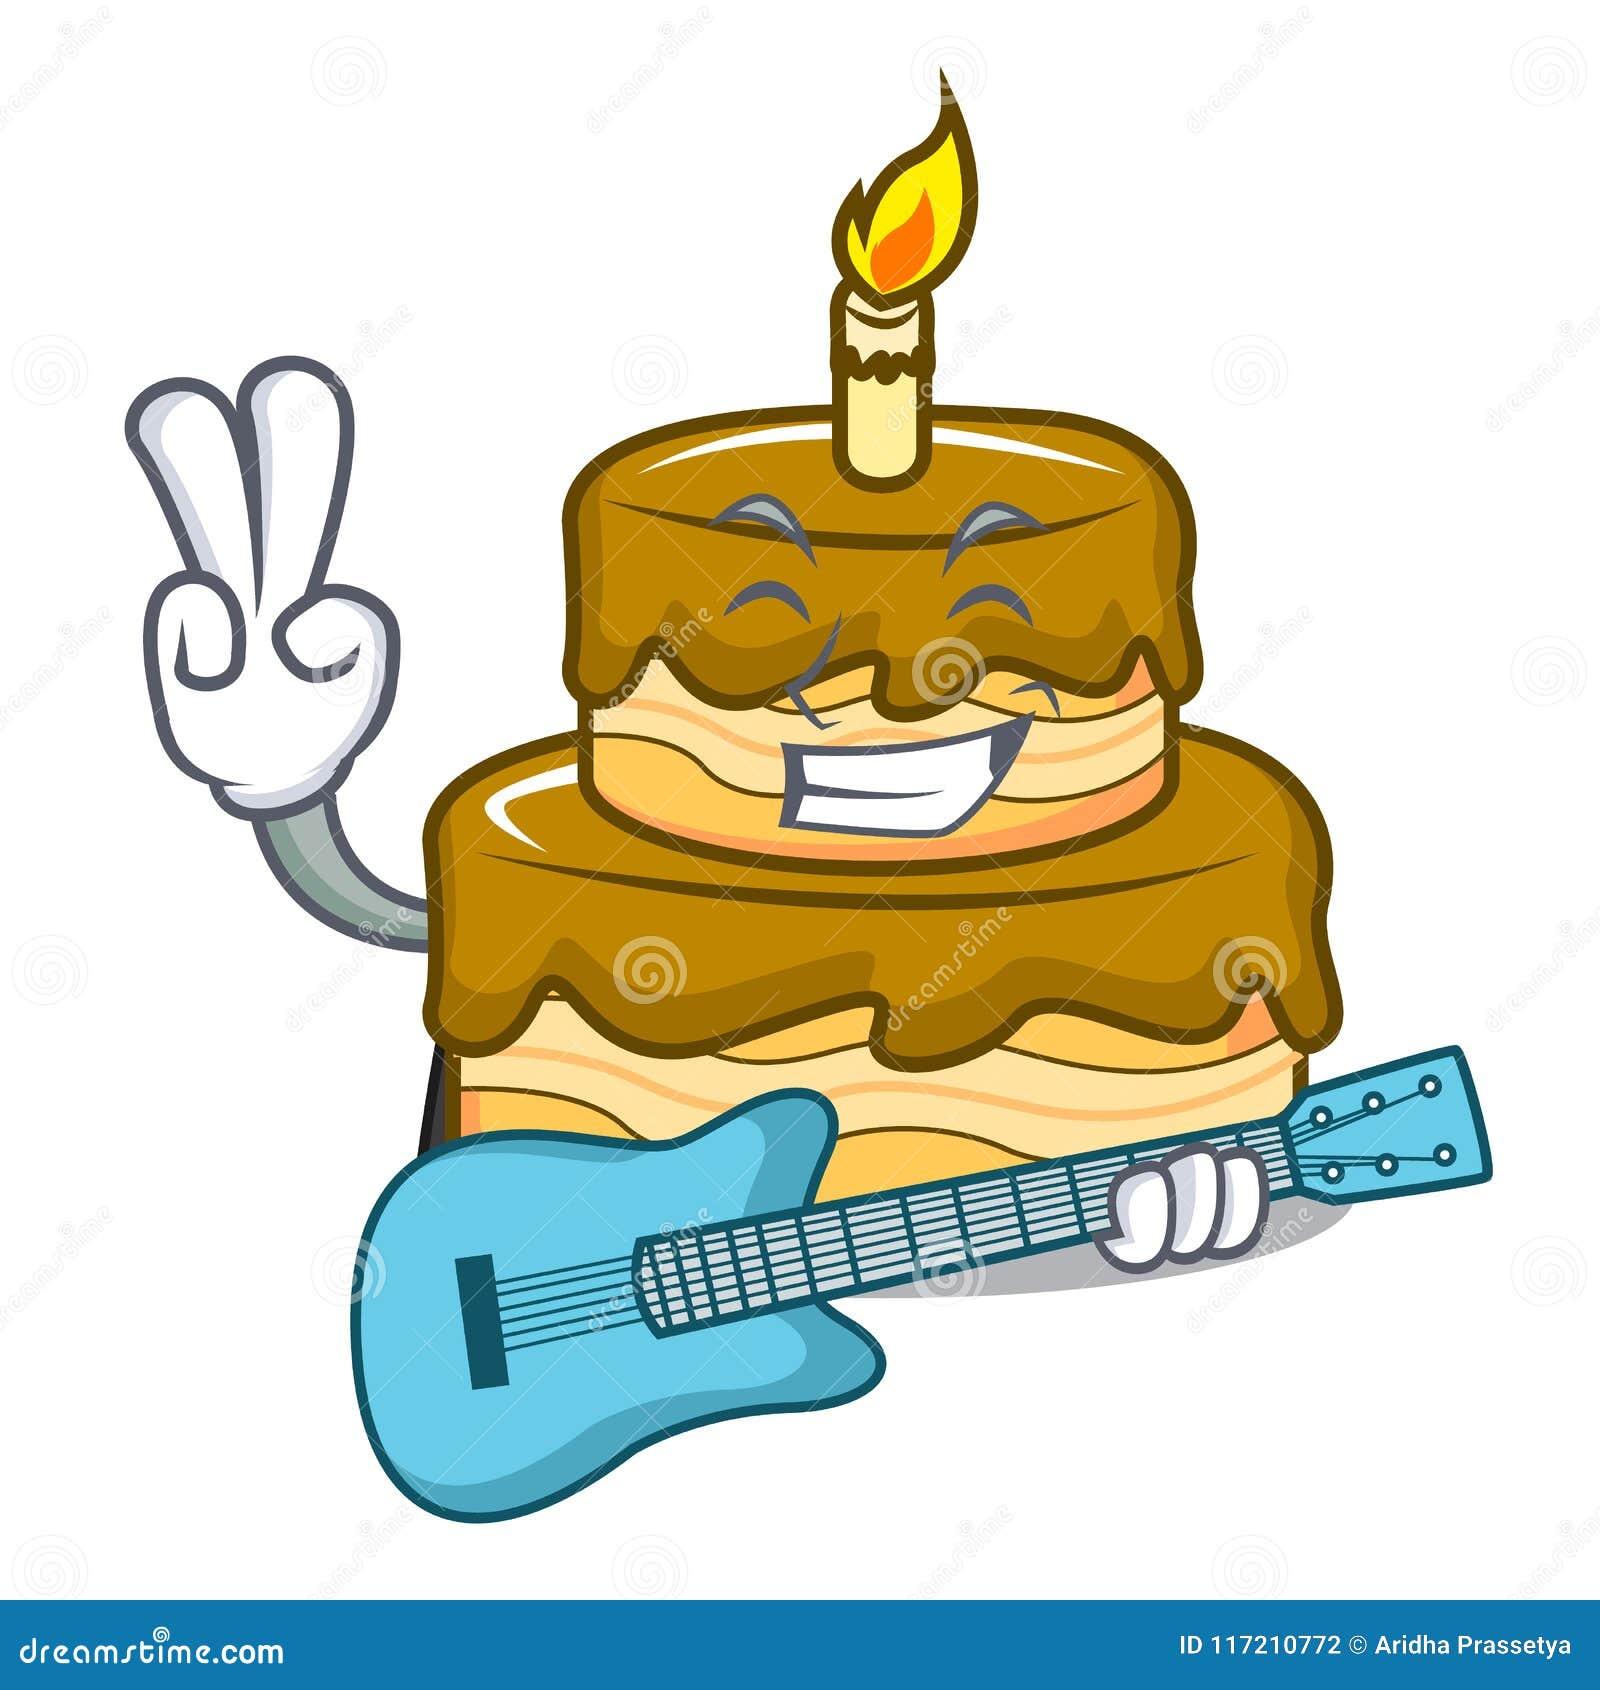 Enjoyable With Guitar Birthday Cake Mascot Cartoon Stock Vector Funny Birthday Cards Online Amentibdeldamsfinfo